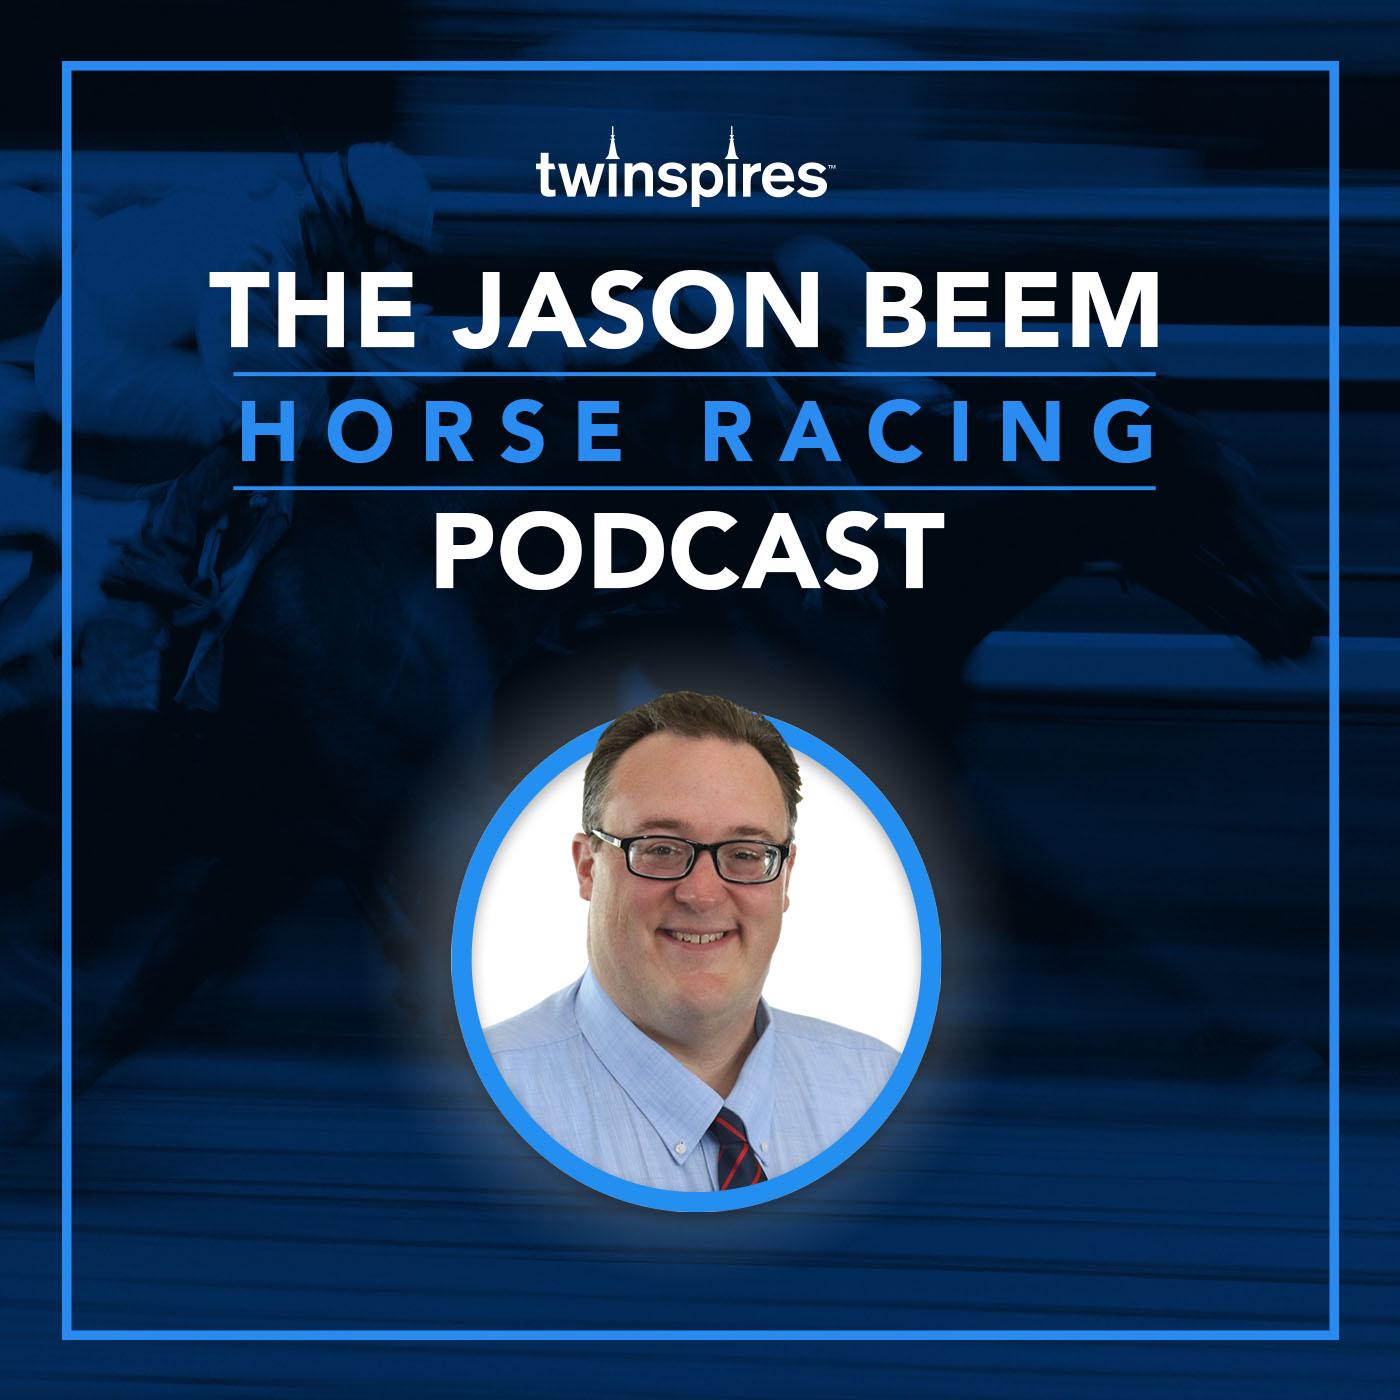 The Jason Beem Horse Racing Podcast show art